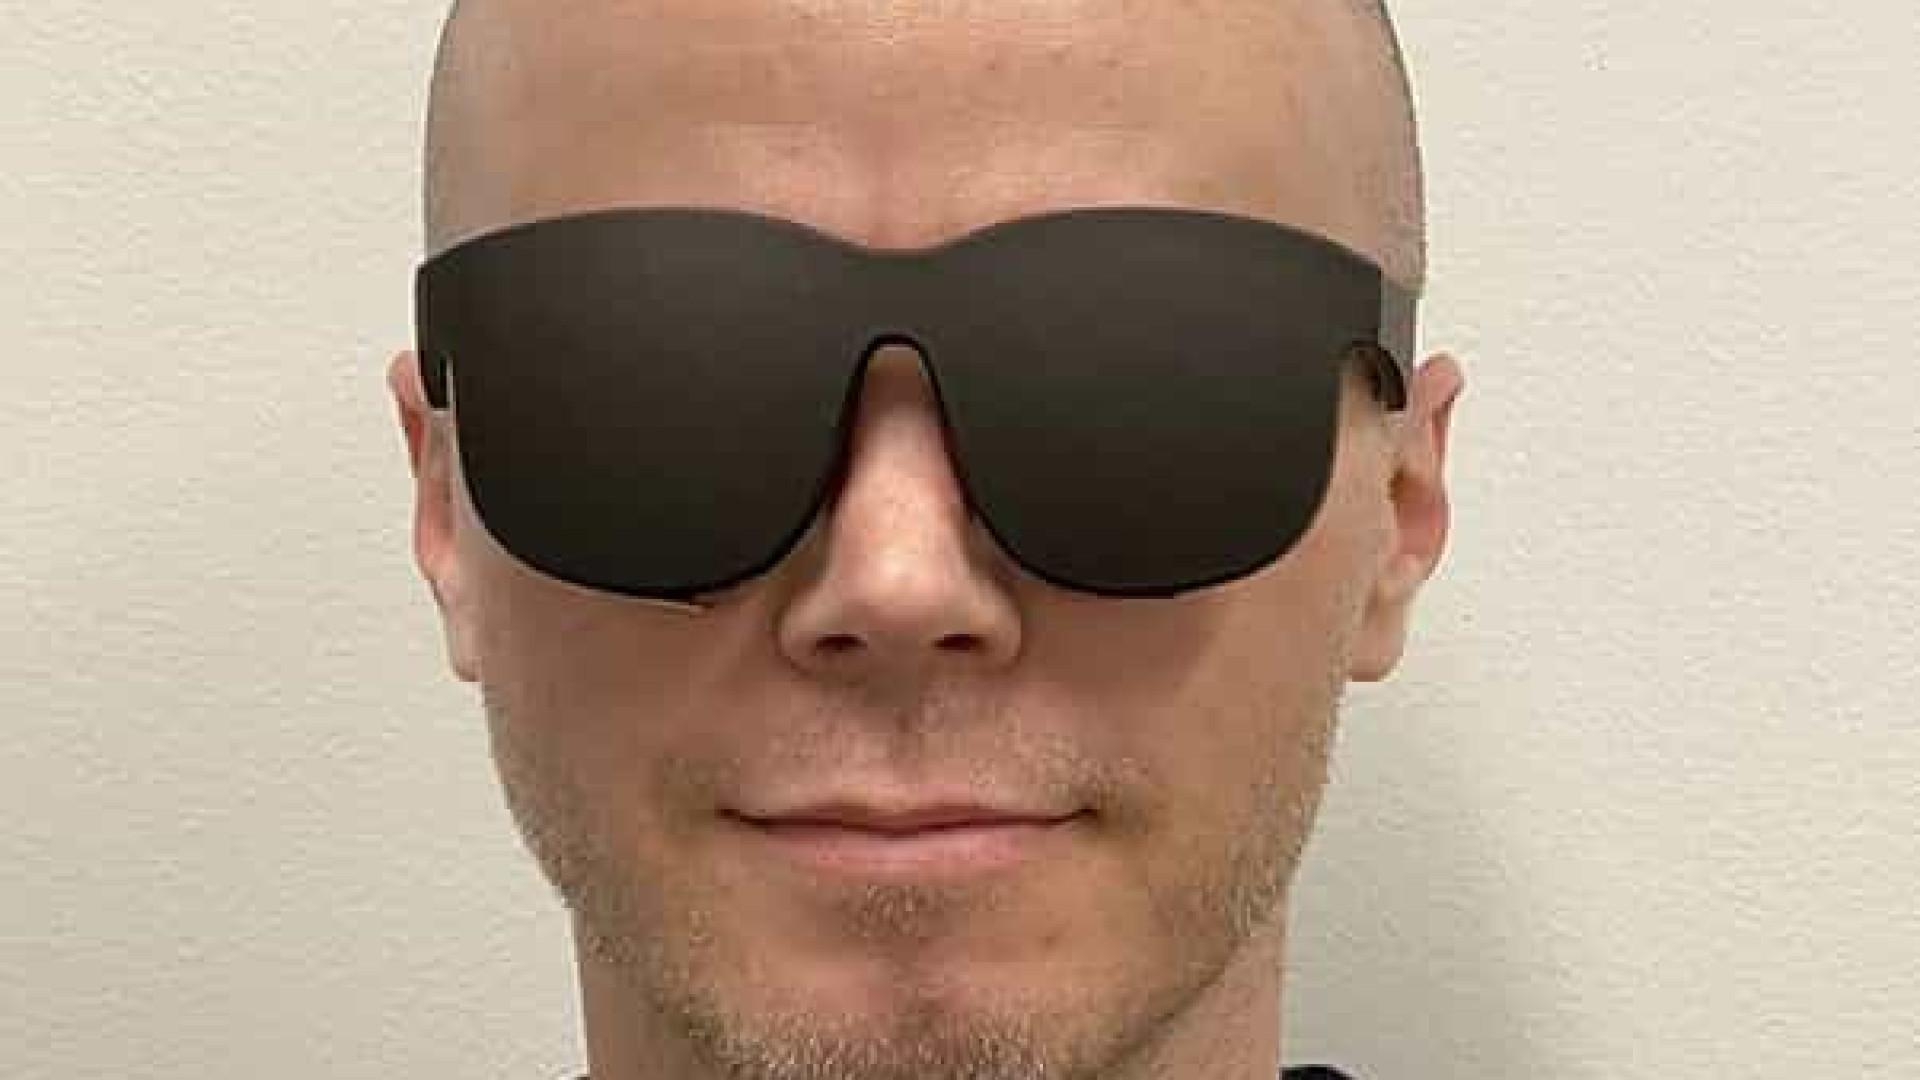 Facebook cria protótipo para evoluir óculos de Realidade Virtual